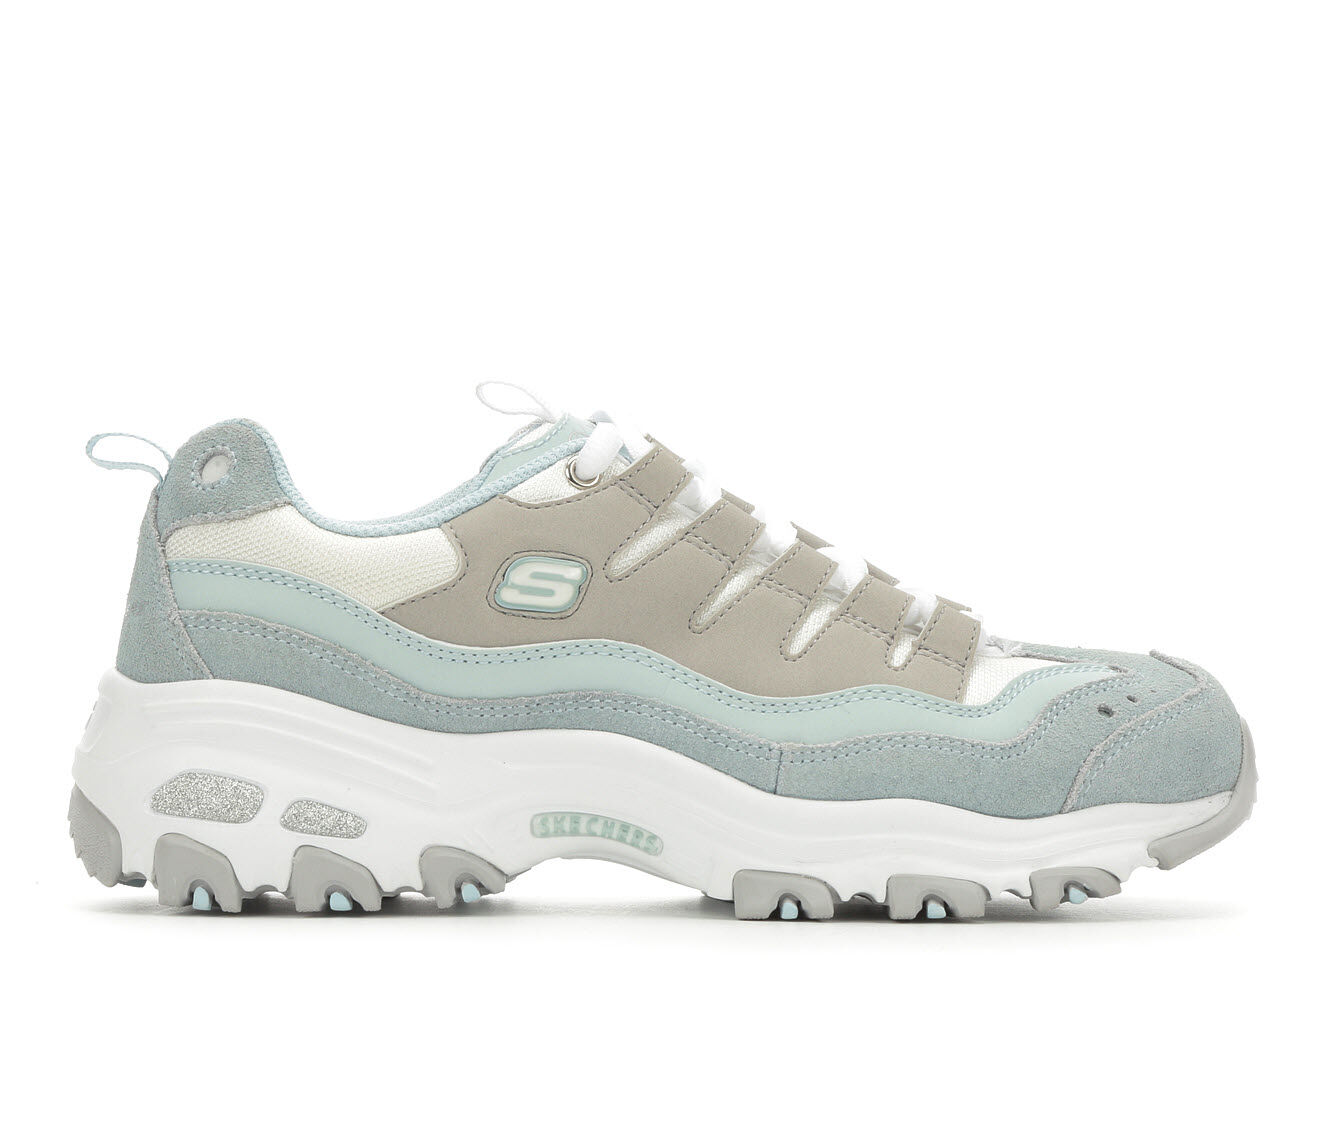 Women's Skechers D'Lites Sure Thing 13141 Sneakers Blue/Grey/Wht